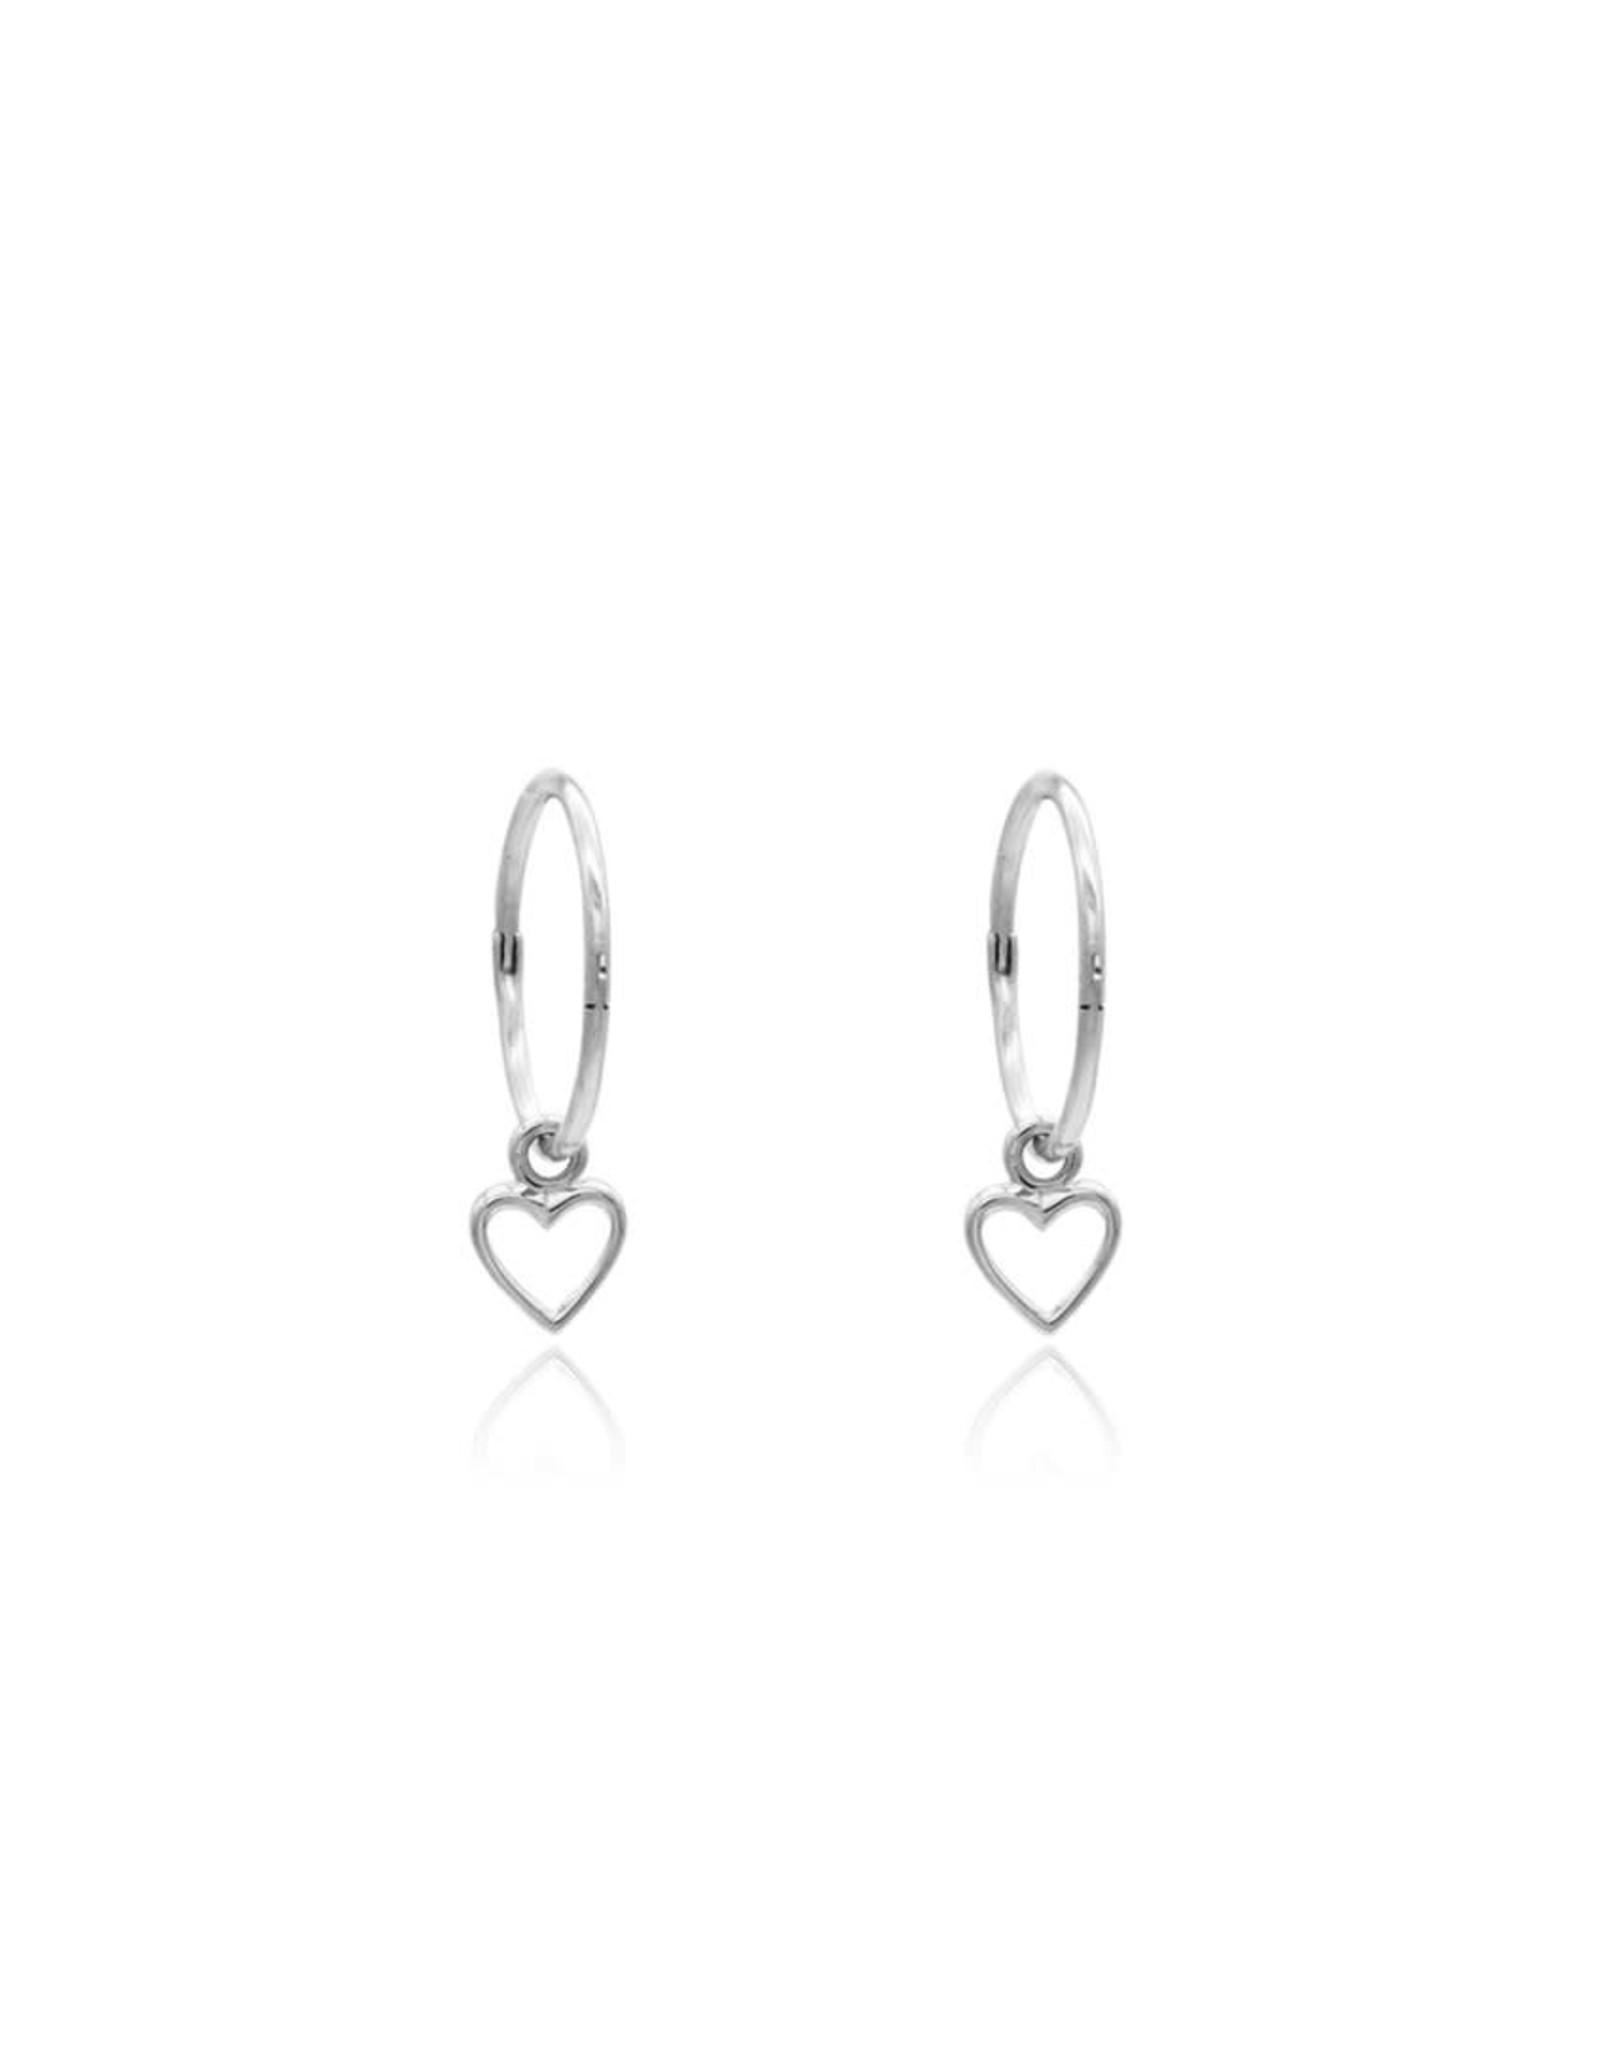 Linda Tahija Open Heart Sleeper Earrings, Silver